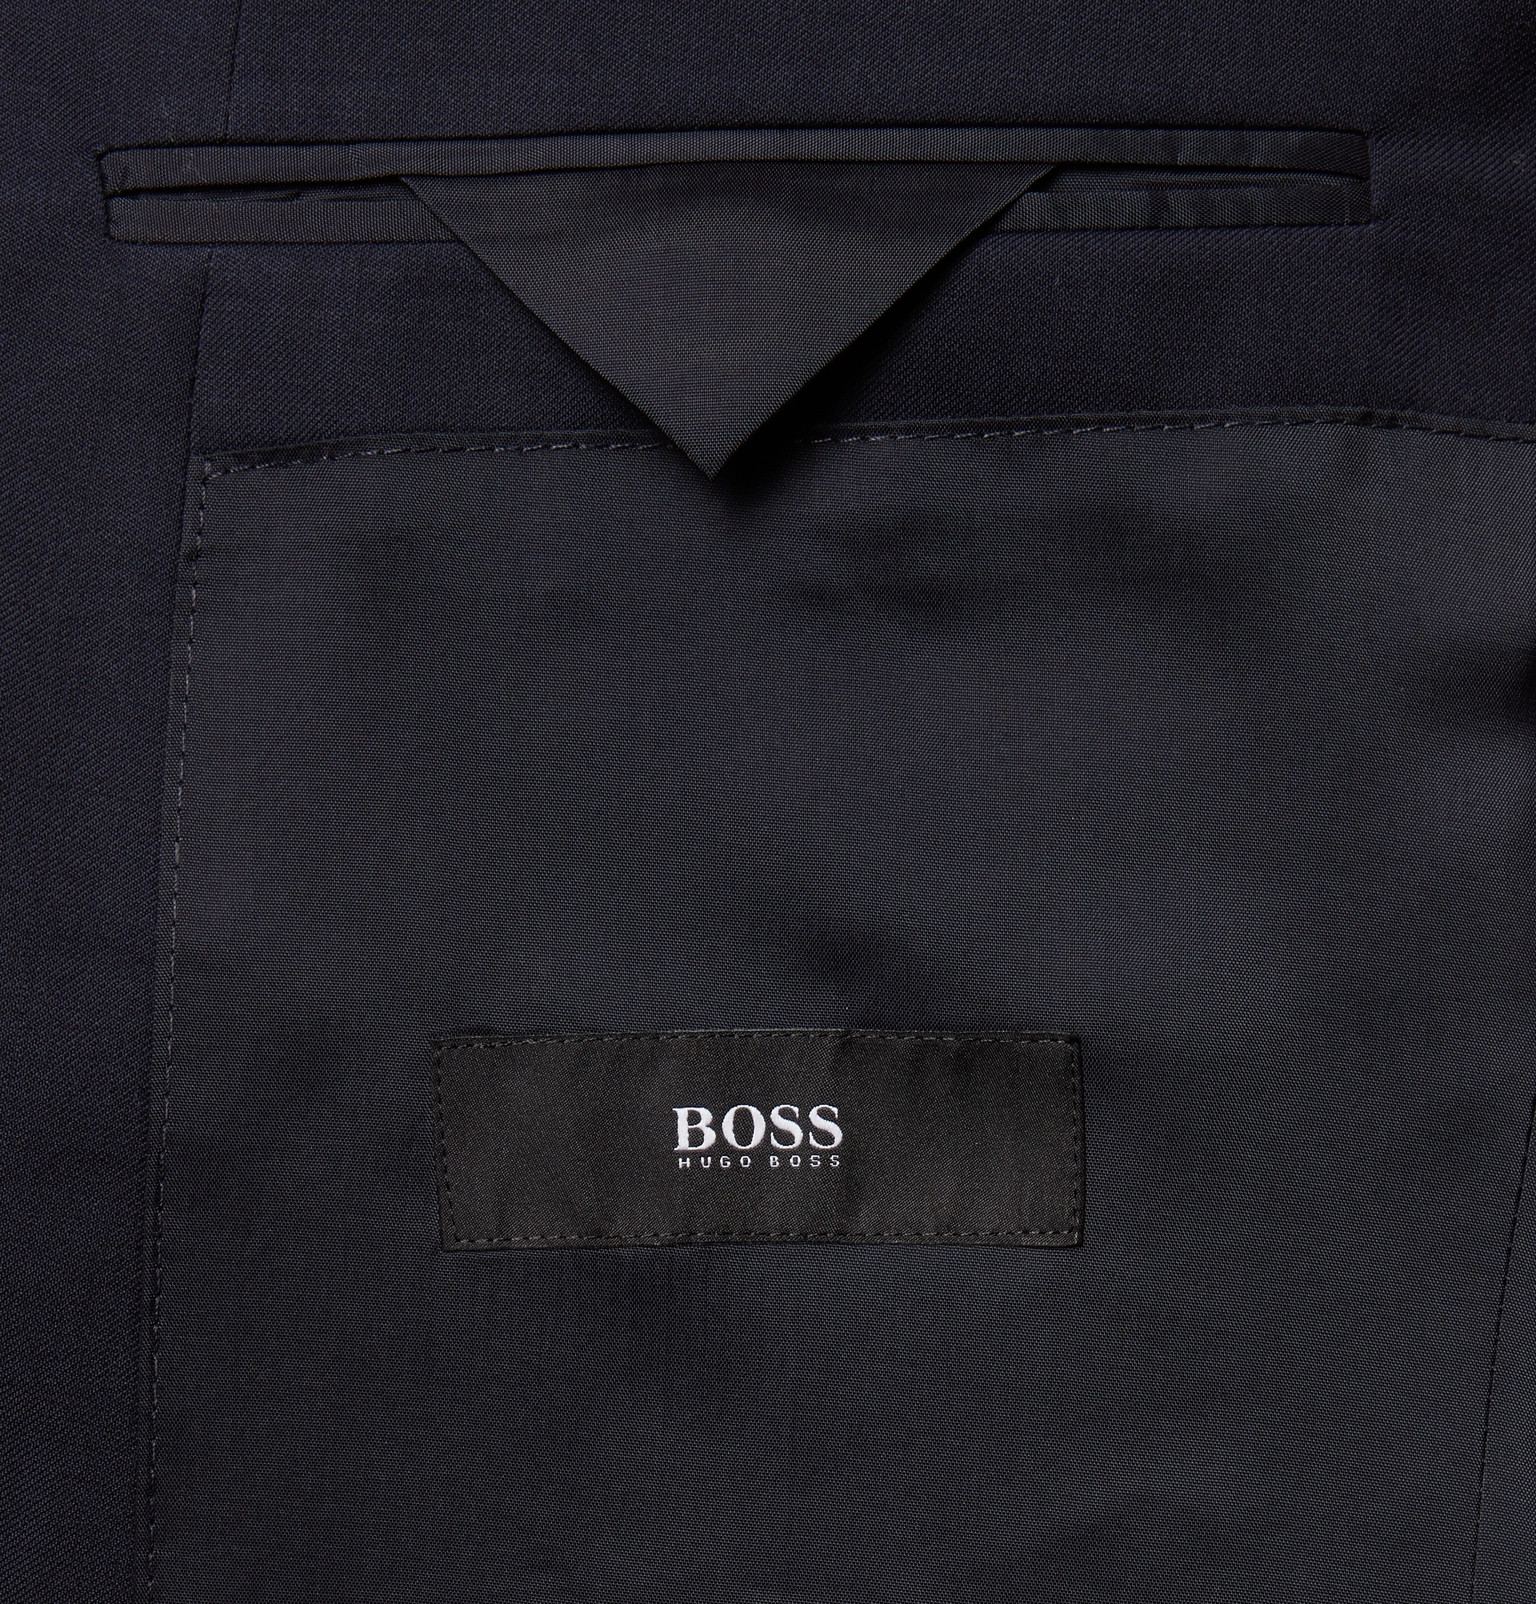 9f08e5ea2 Hugo BossBlue Hayes Slim-Fit Super 120s Virgin Wool Suit Jacket. $650. Tap  to Close. 1